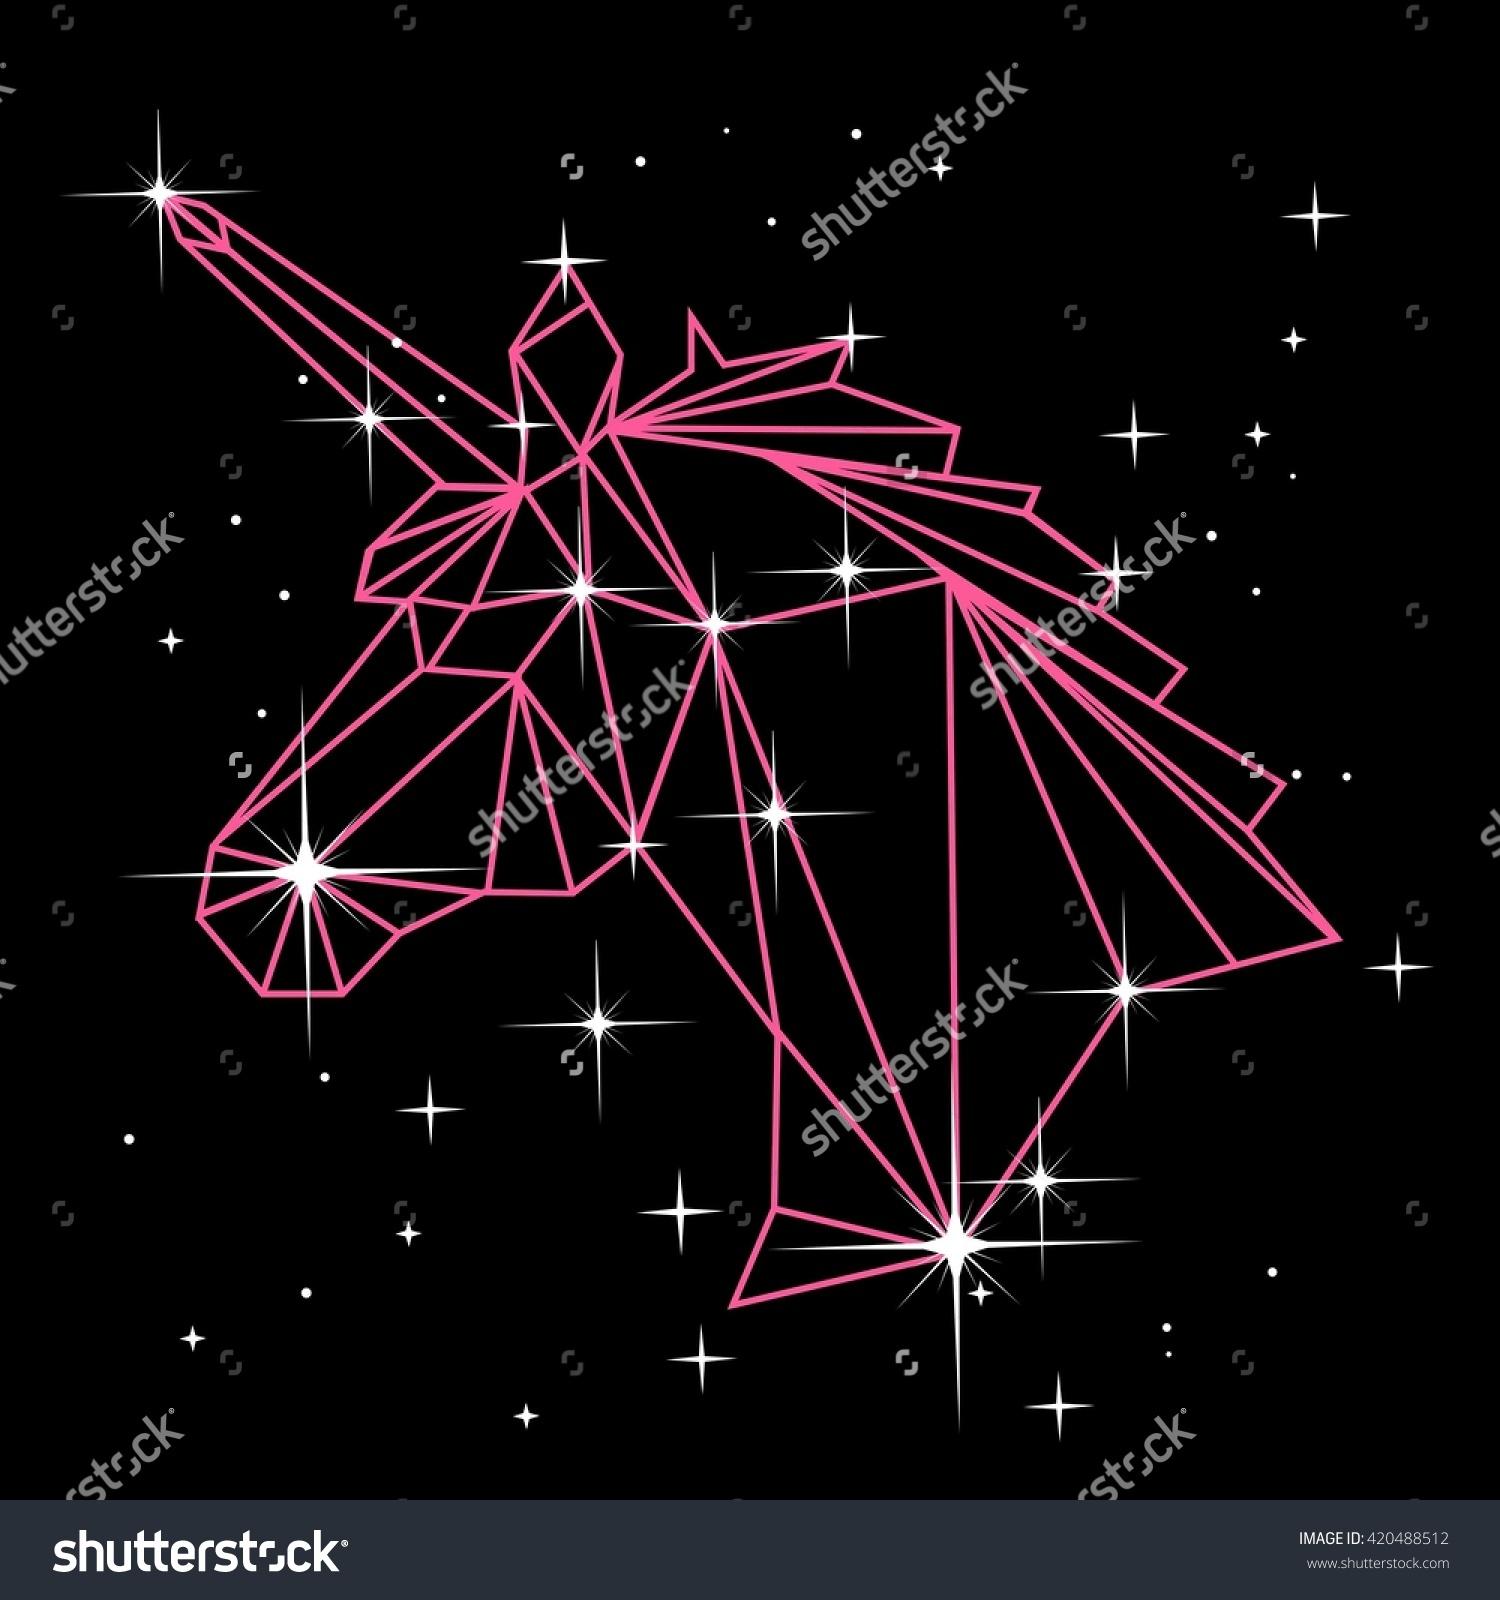 Vector Polygonal Illustration Geometric Unicorn Head Stock Vector.